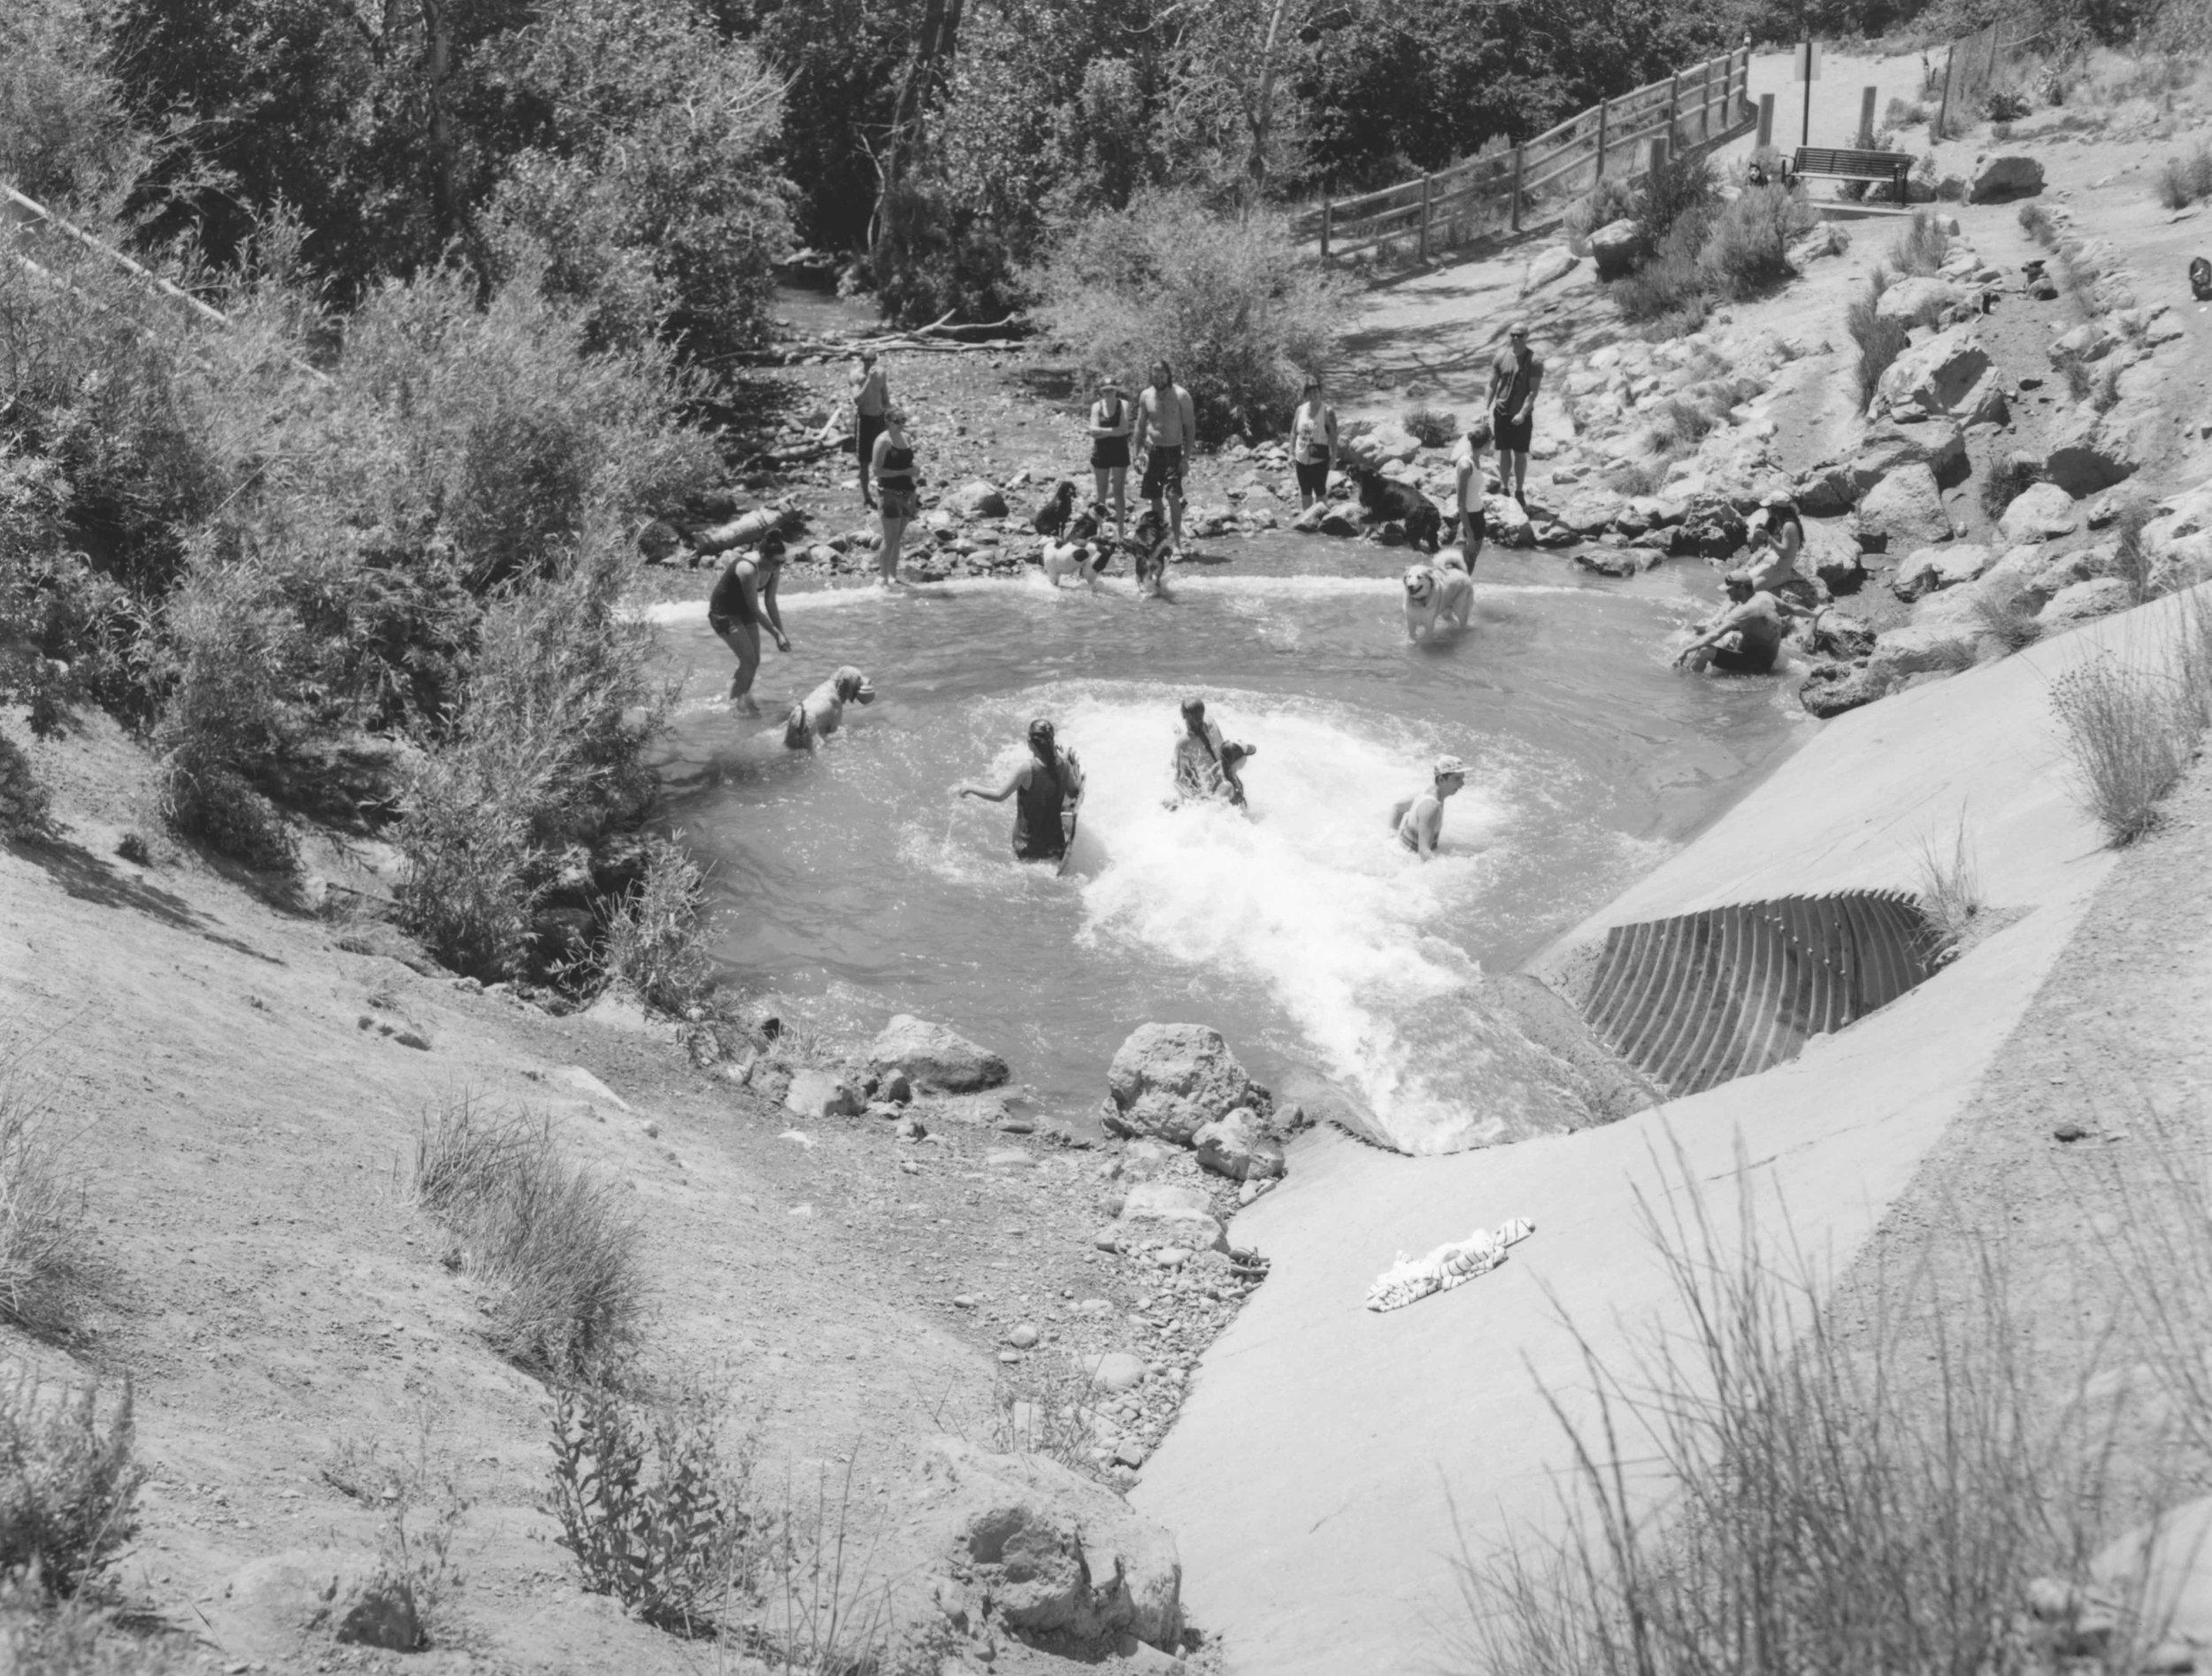 Parley's Creek flows through a culvert into Tanner Park.